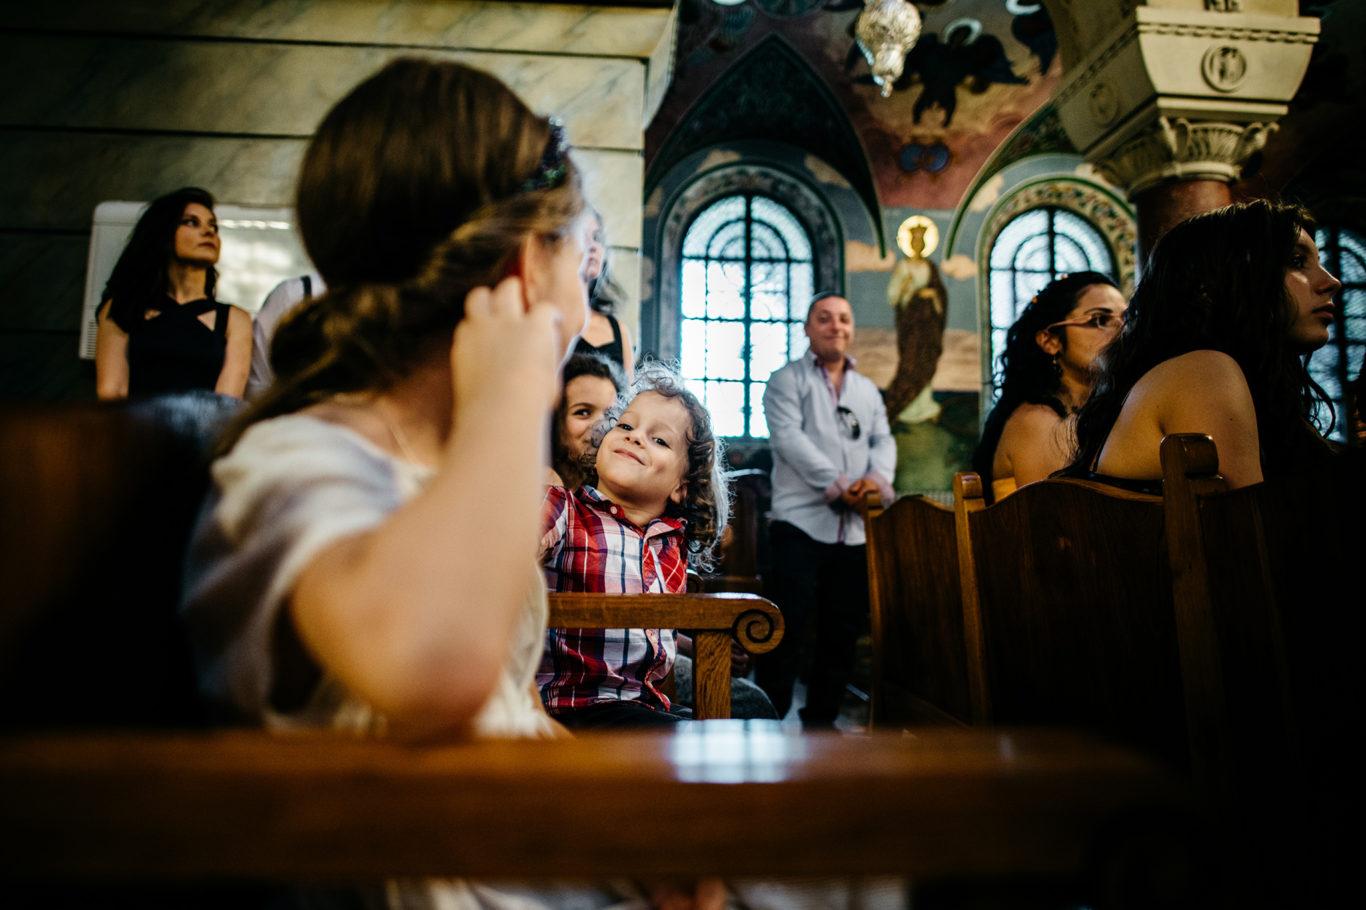 0358-fotografie-nunta-bucuresti-rodica-rares-fotograf-ciprian-dumitrescu-dsc_2583